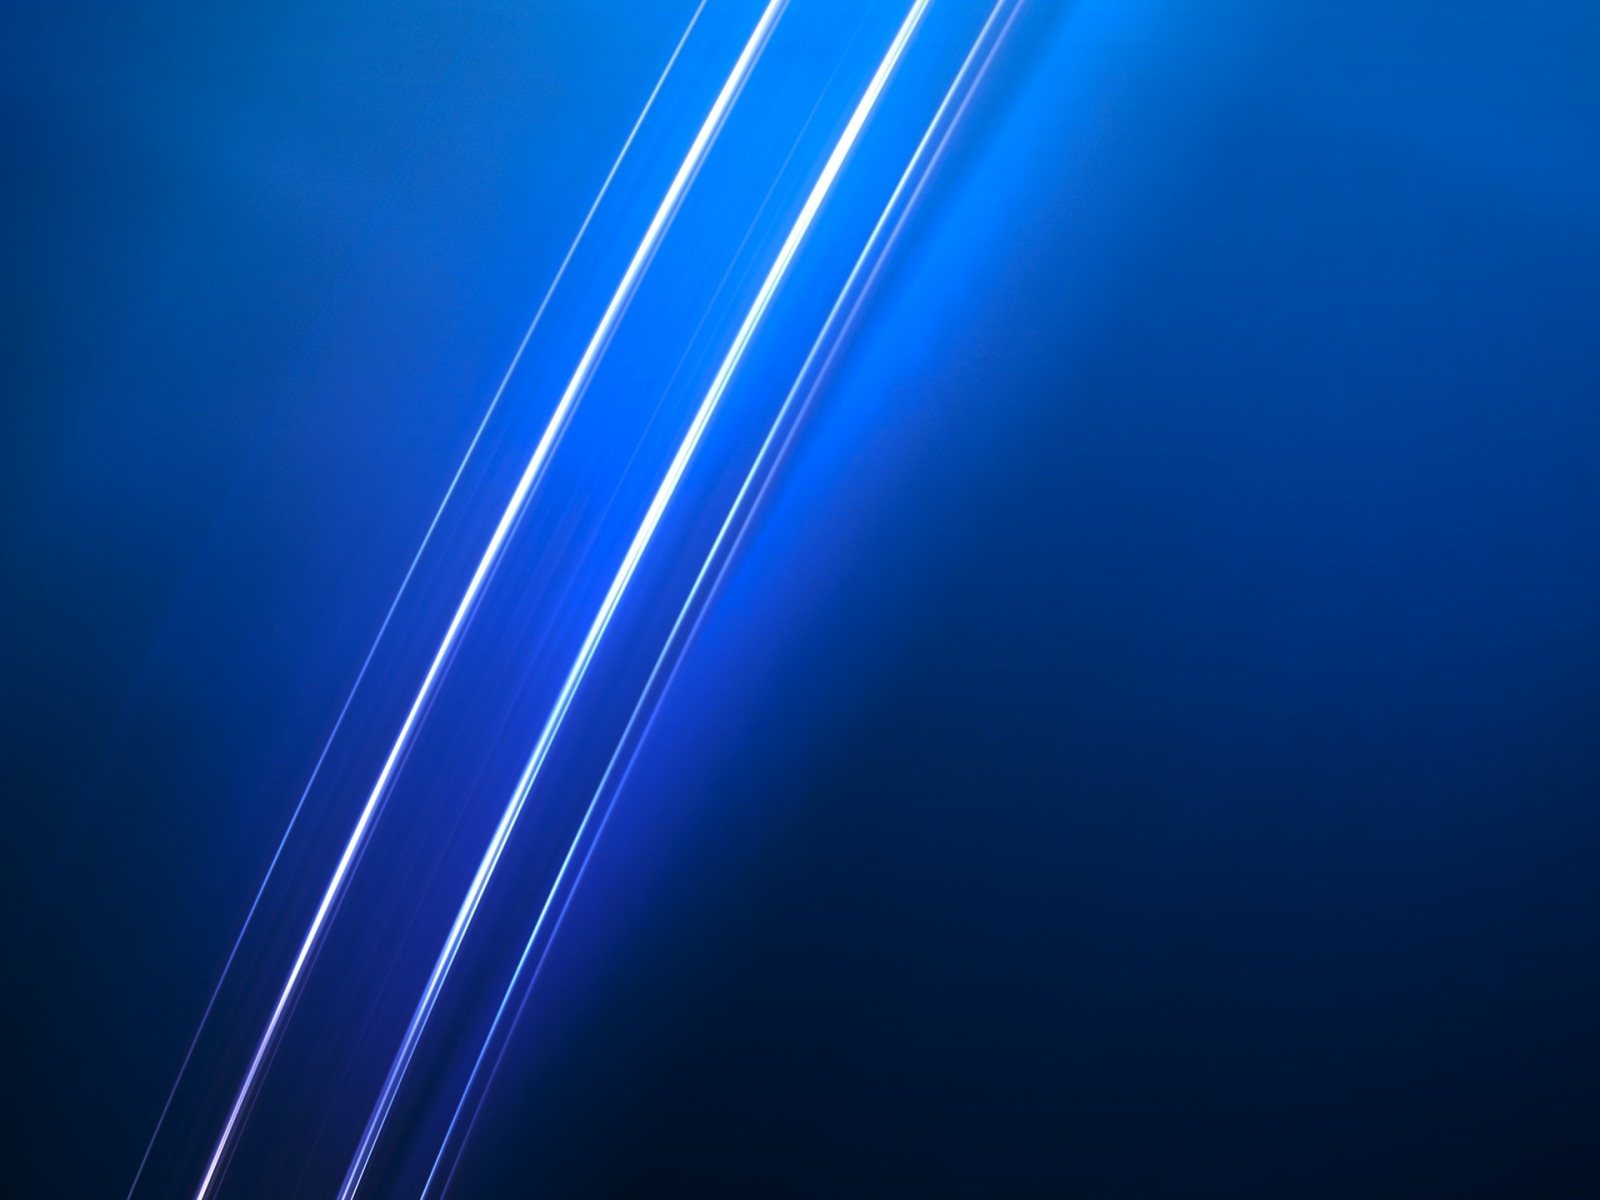 http://2.bp.blogspot.com/-uVA7njnVn2w/TWdrqKF8lMI/AAAAAAAADa8/NmeOkBA2jcI/s1600/Blauwe-achtergronden-blauw-achtergrond-blauwe-wallpapers-hd-3.jpg